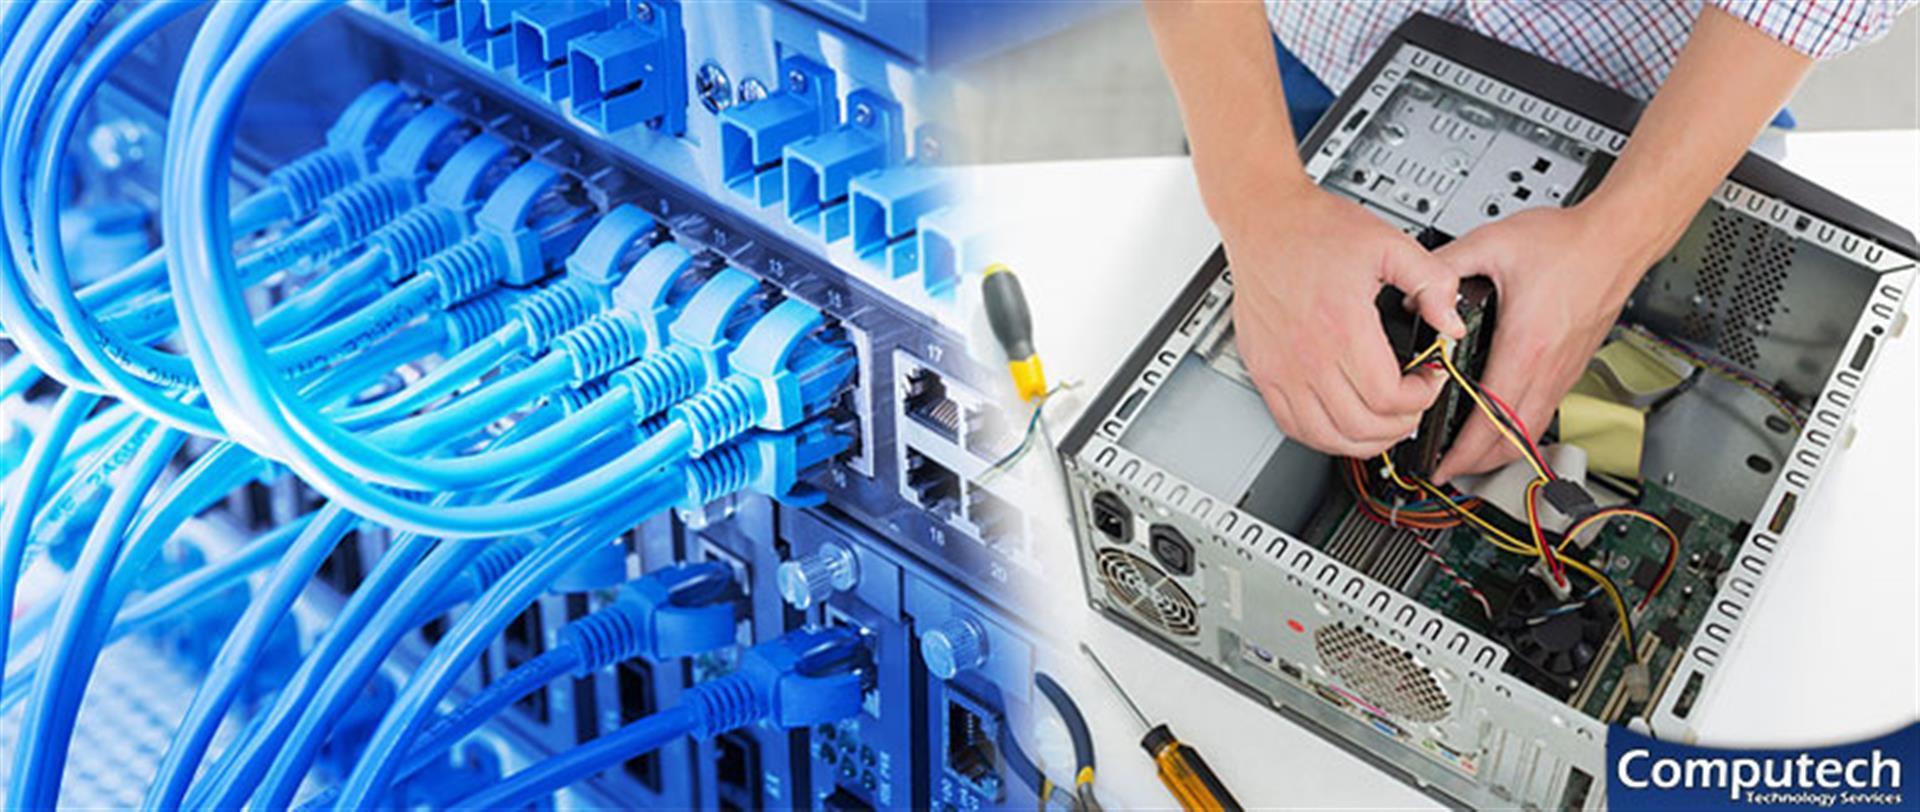 Saint Johns Arizona Onsite Computer PC & Printer Repair, Networks, Telecom and Broadband Data Low Voltage Cabling Solutions